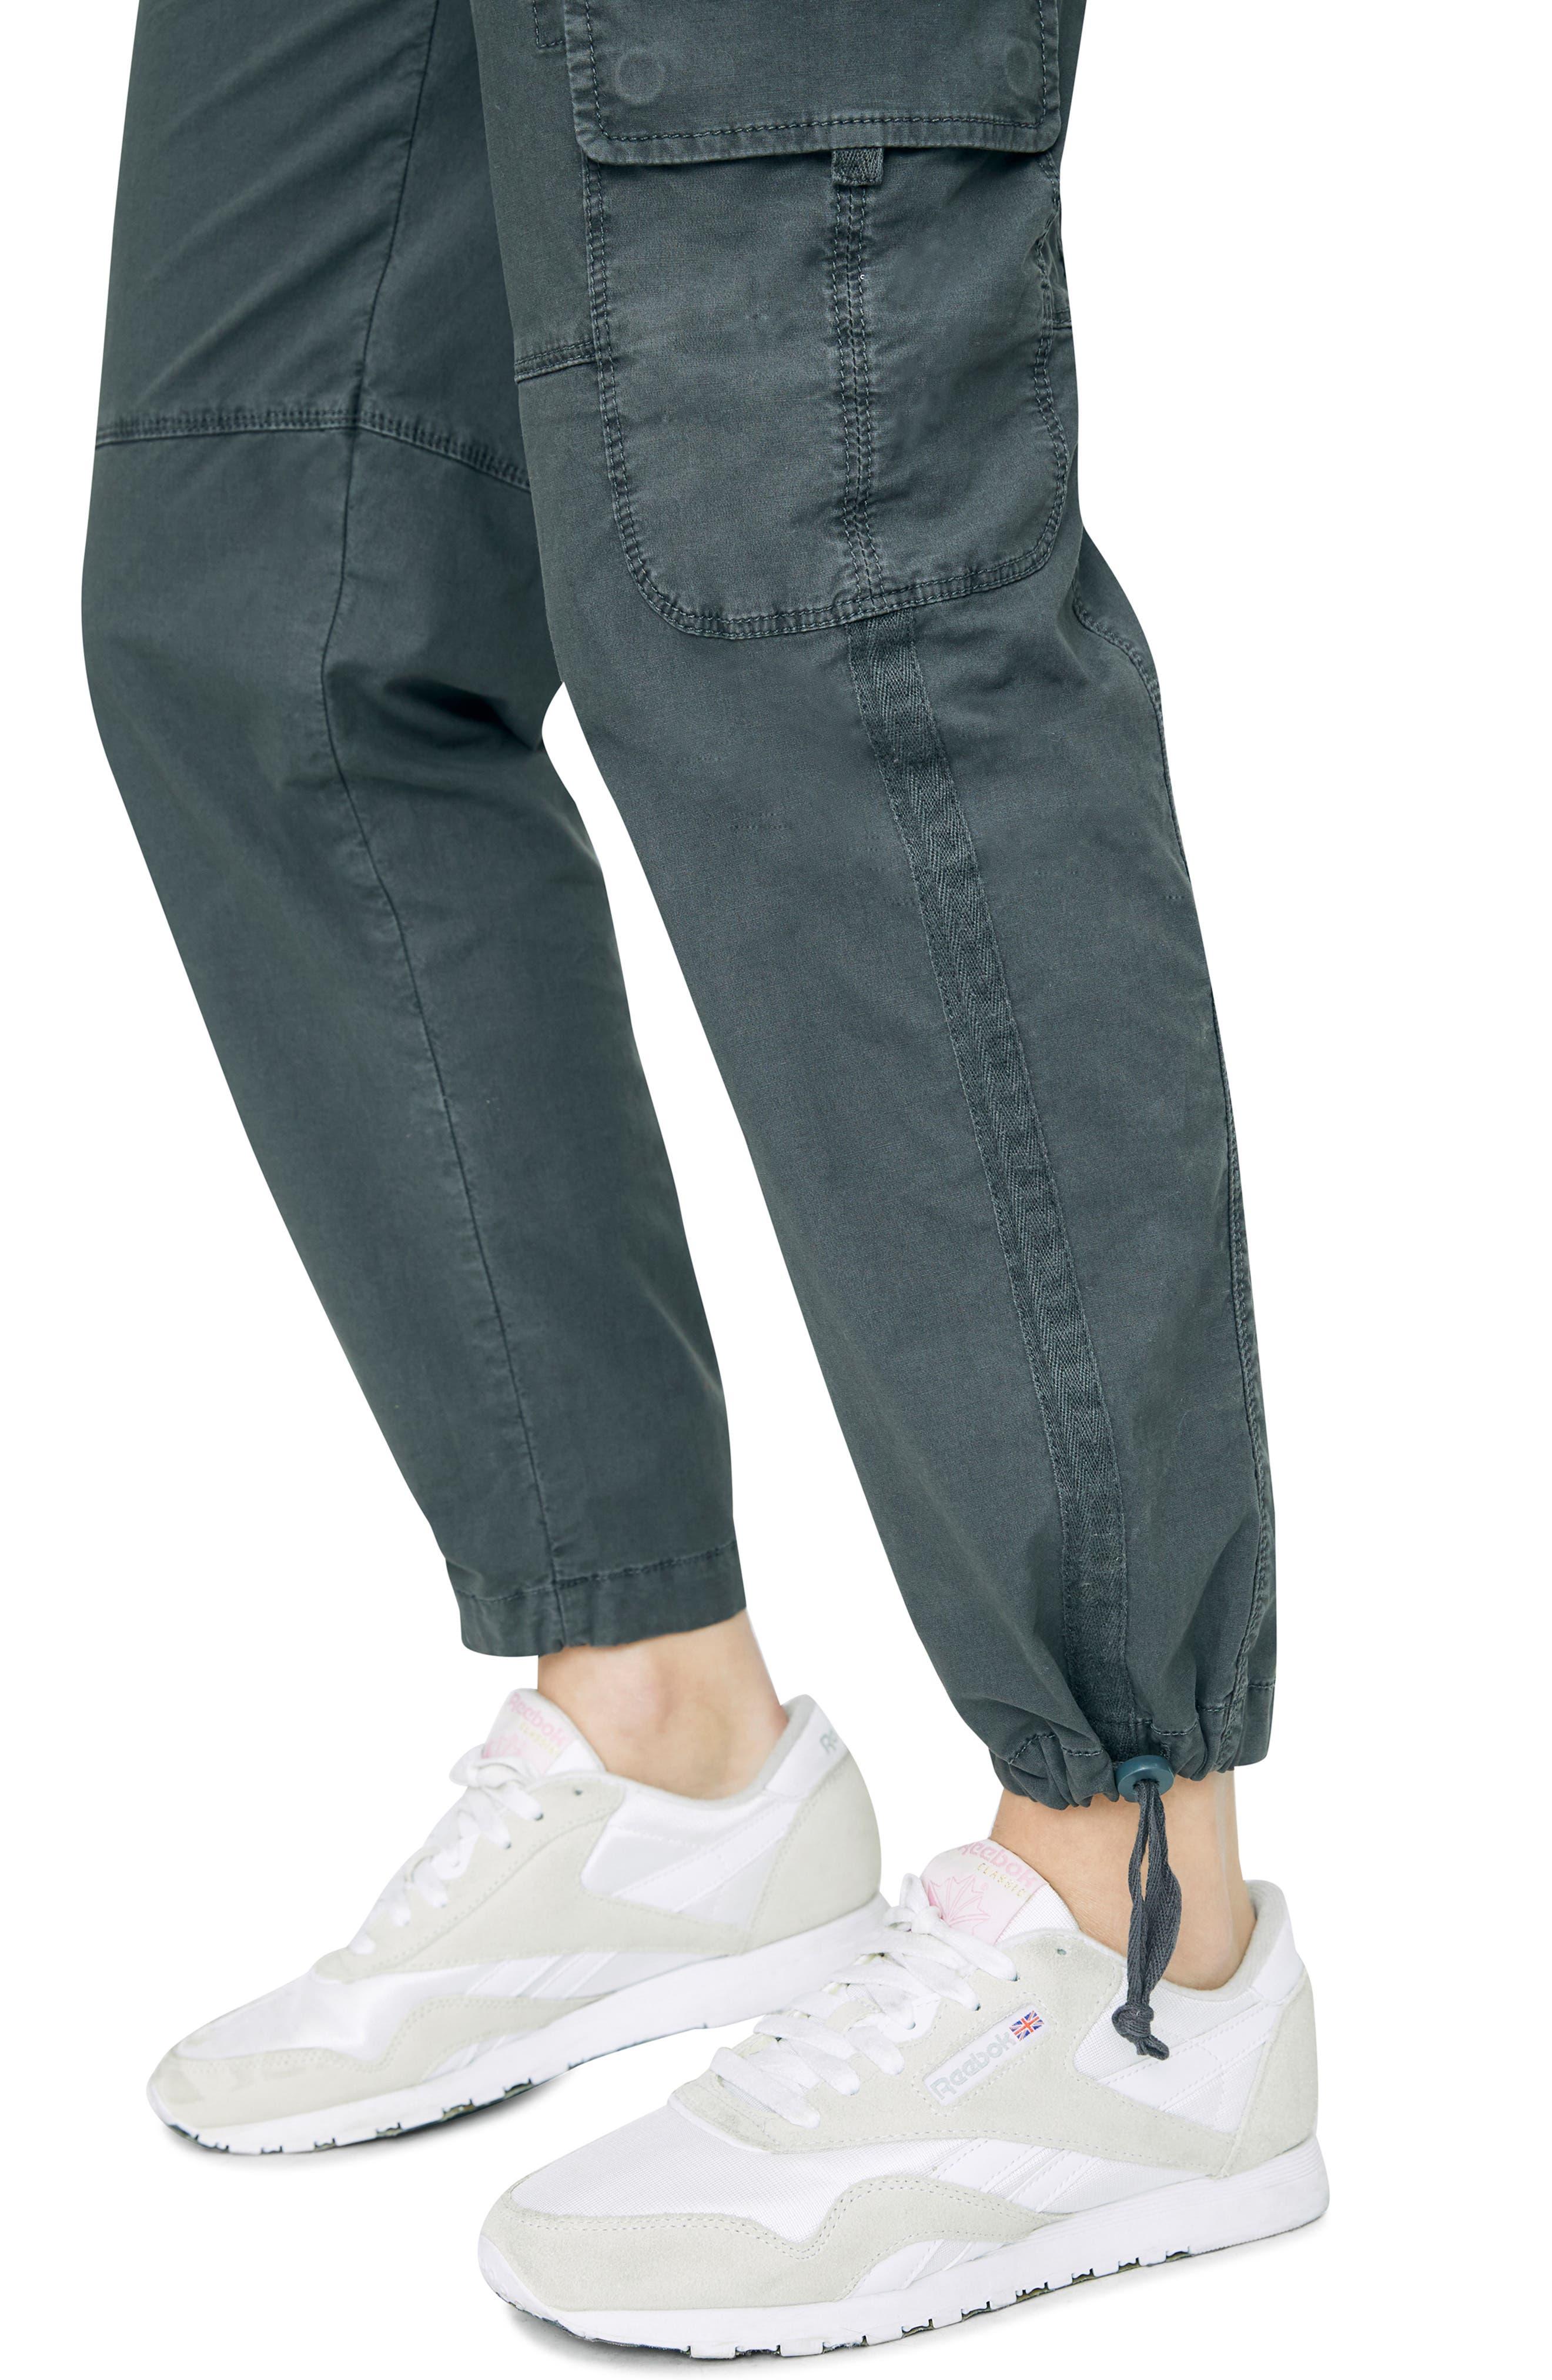 SANCTUARY, Terrain Crop Cargo Pants, Alternate thumbnail 6, color, WASHED FADED BLACK